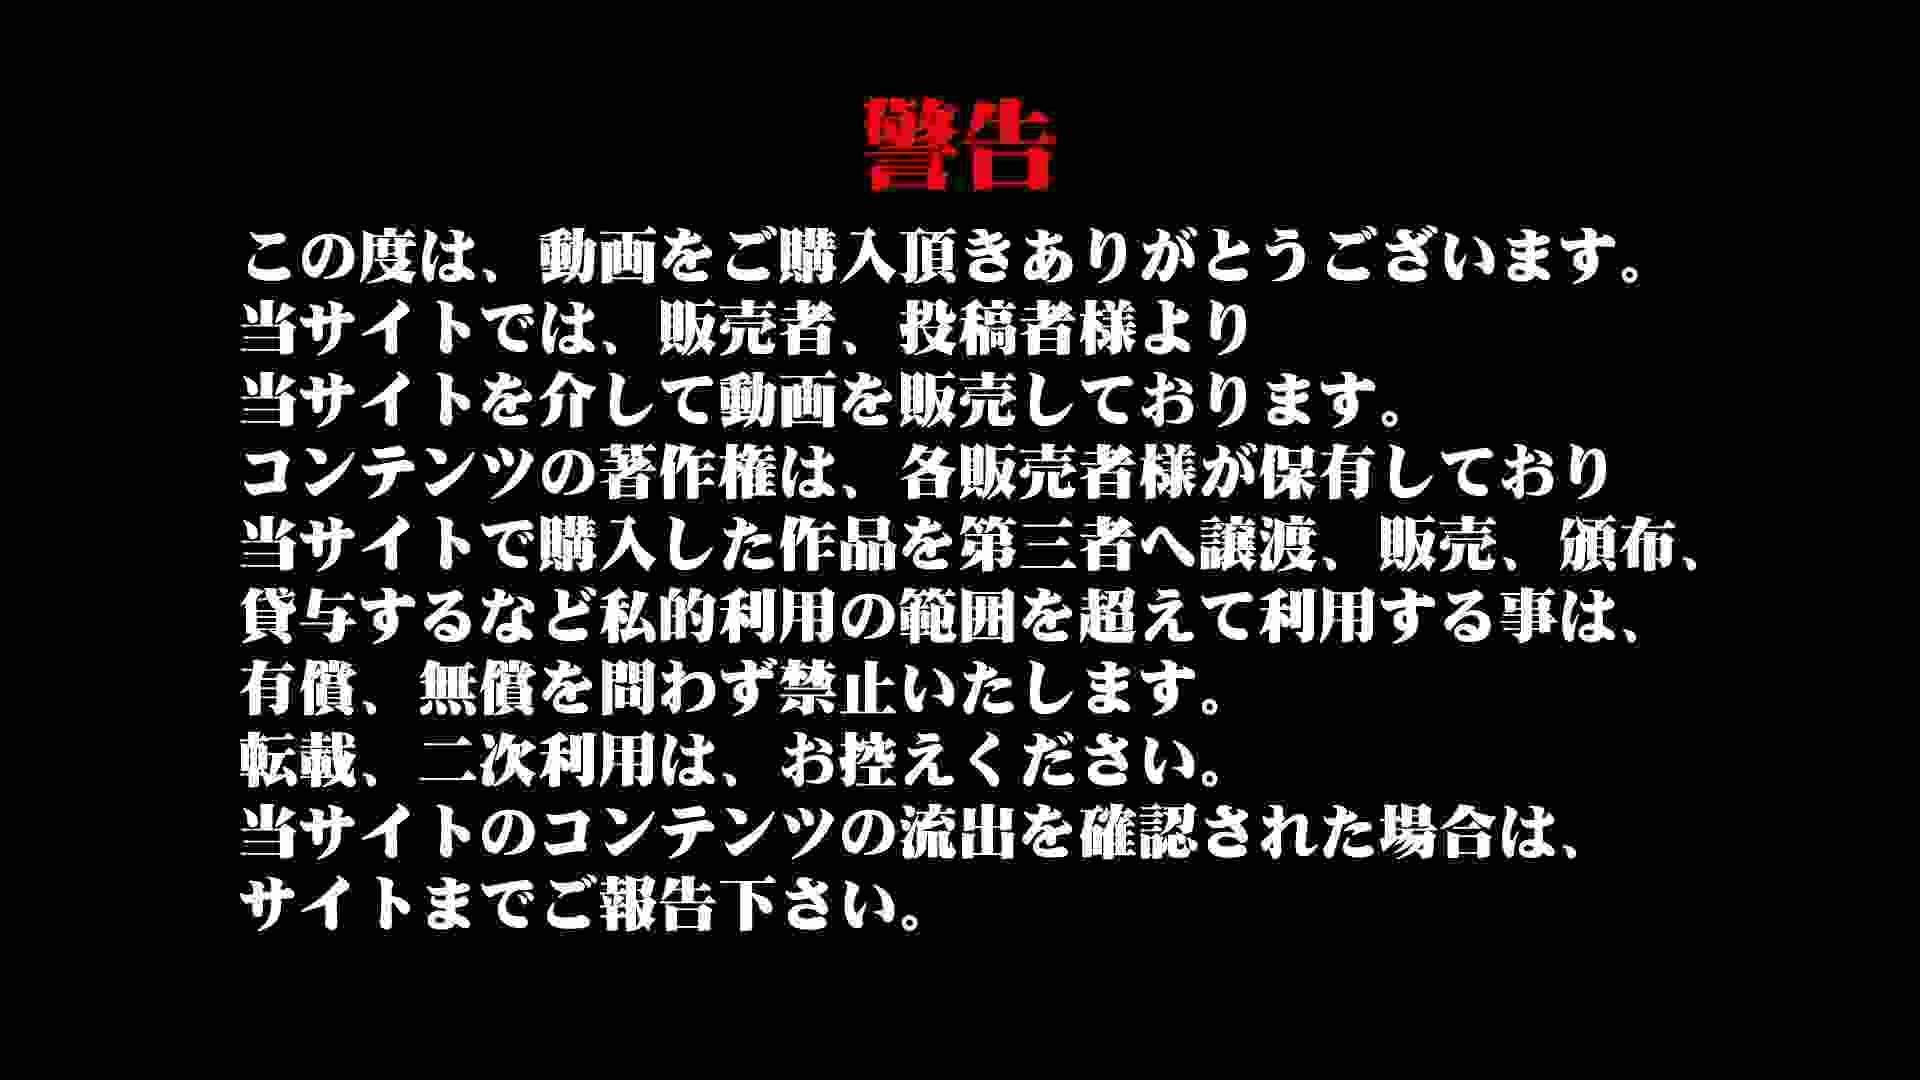 Aquaな露天風呂Vol.895 盗撮師作品  70pic 21